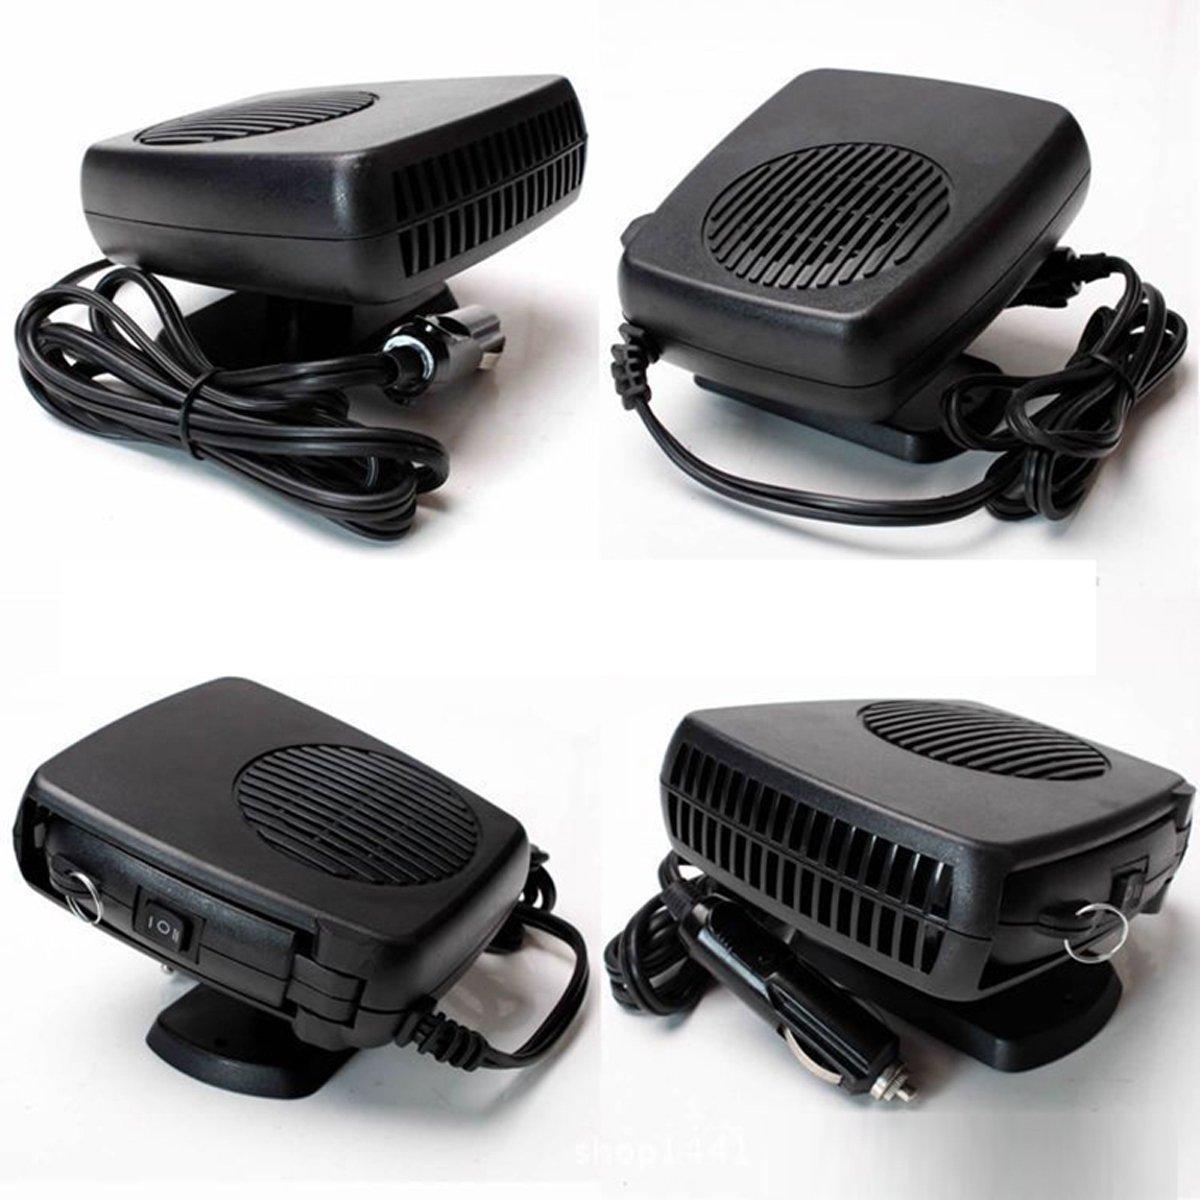 Black Portable Car Heater Defroster 12V 150W Vehicle Cooling Fan Window Demister Windshield Fast Heating Defroster